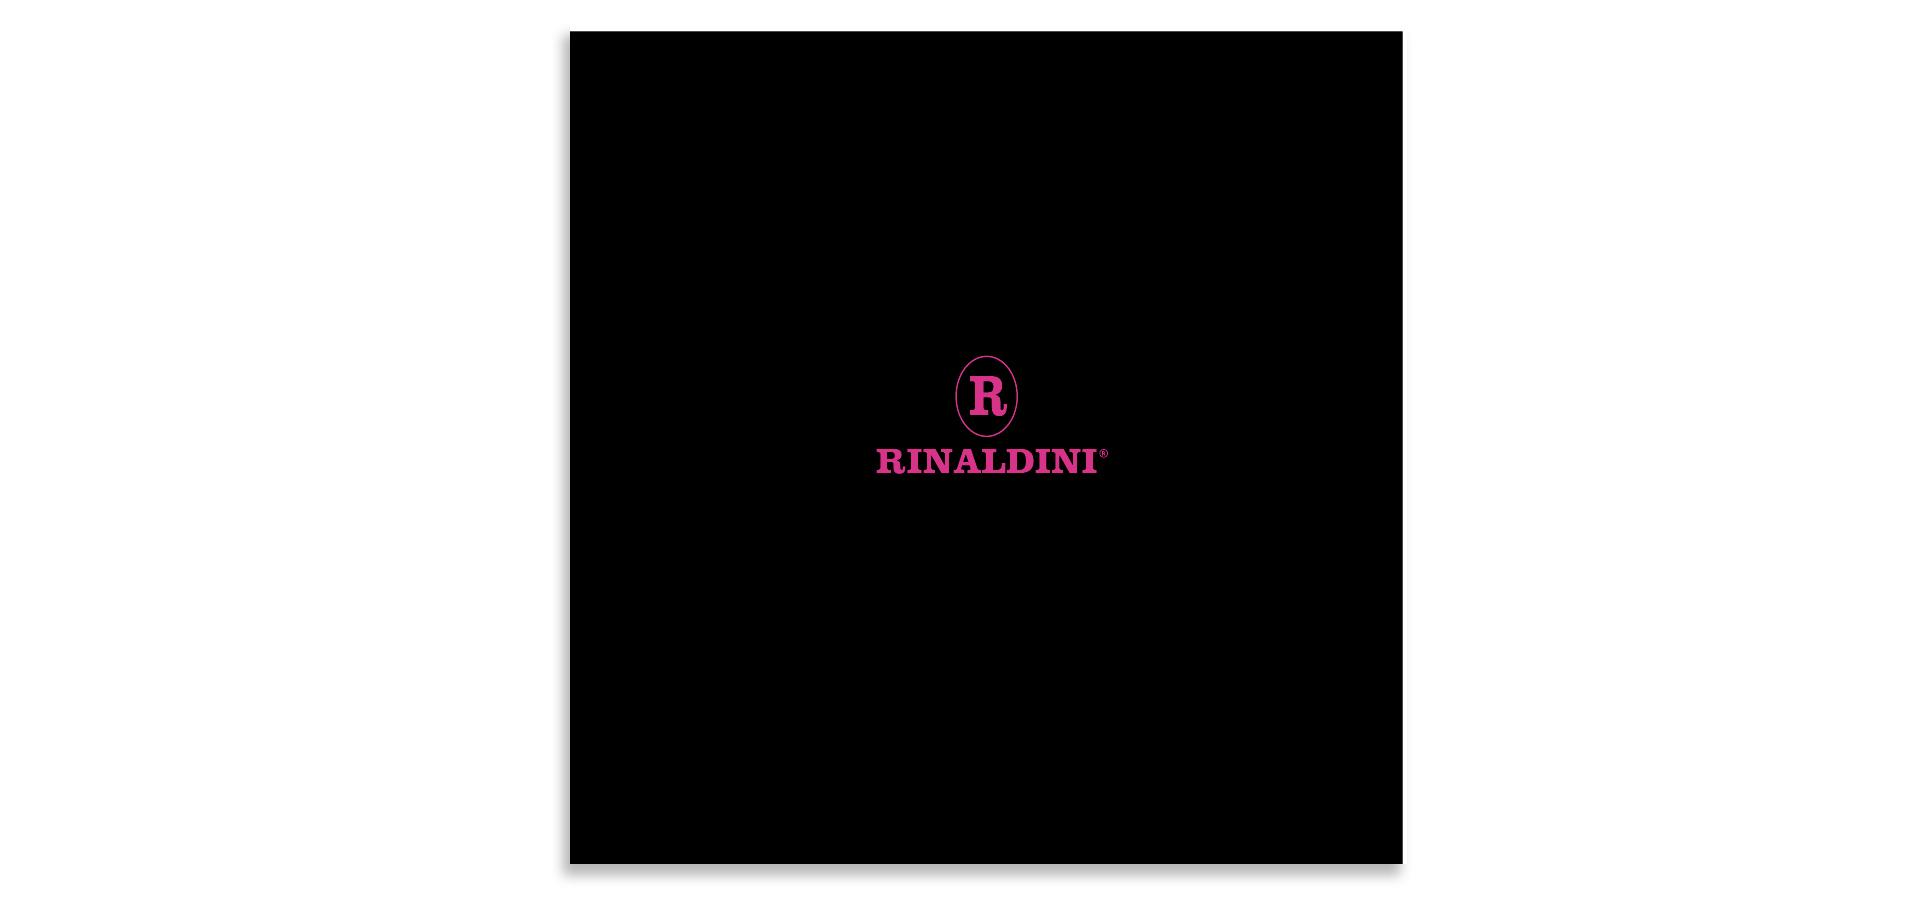 Rinaldini_1920x900_G&M_A2